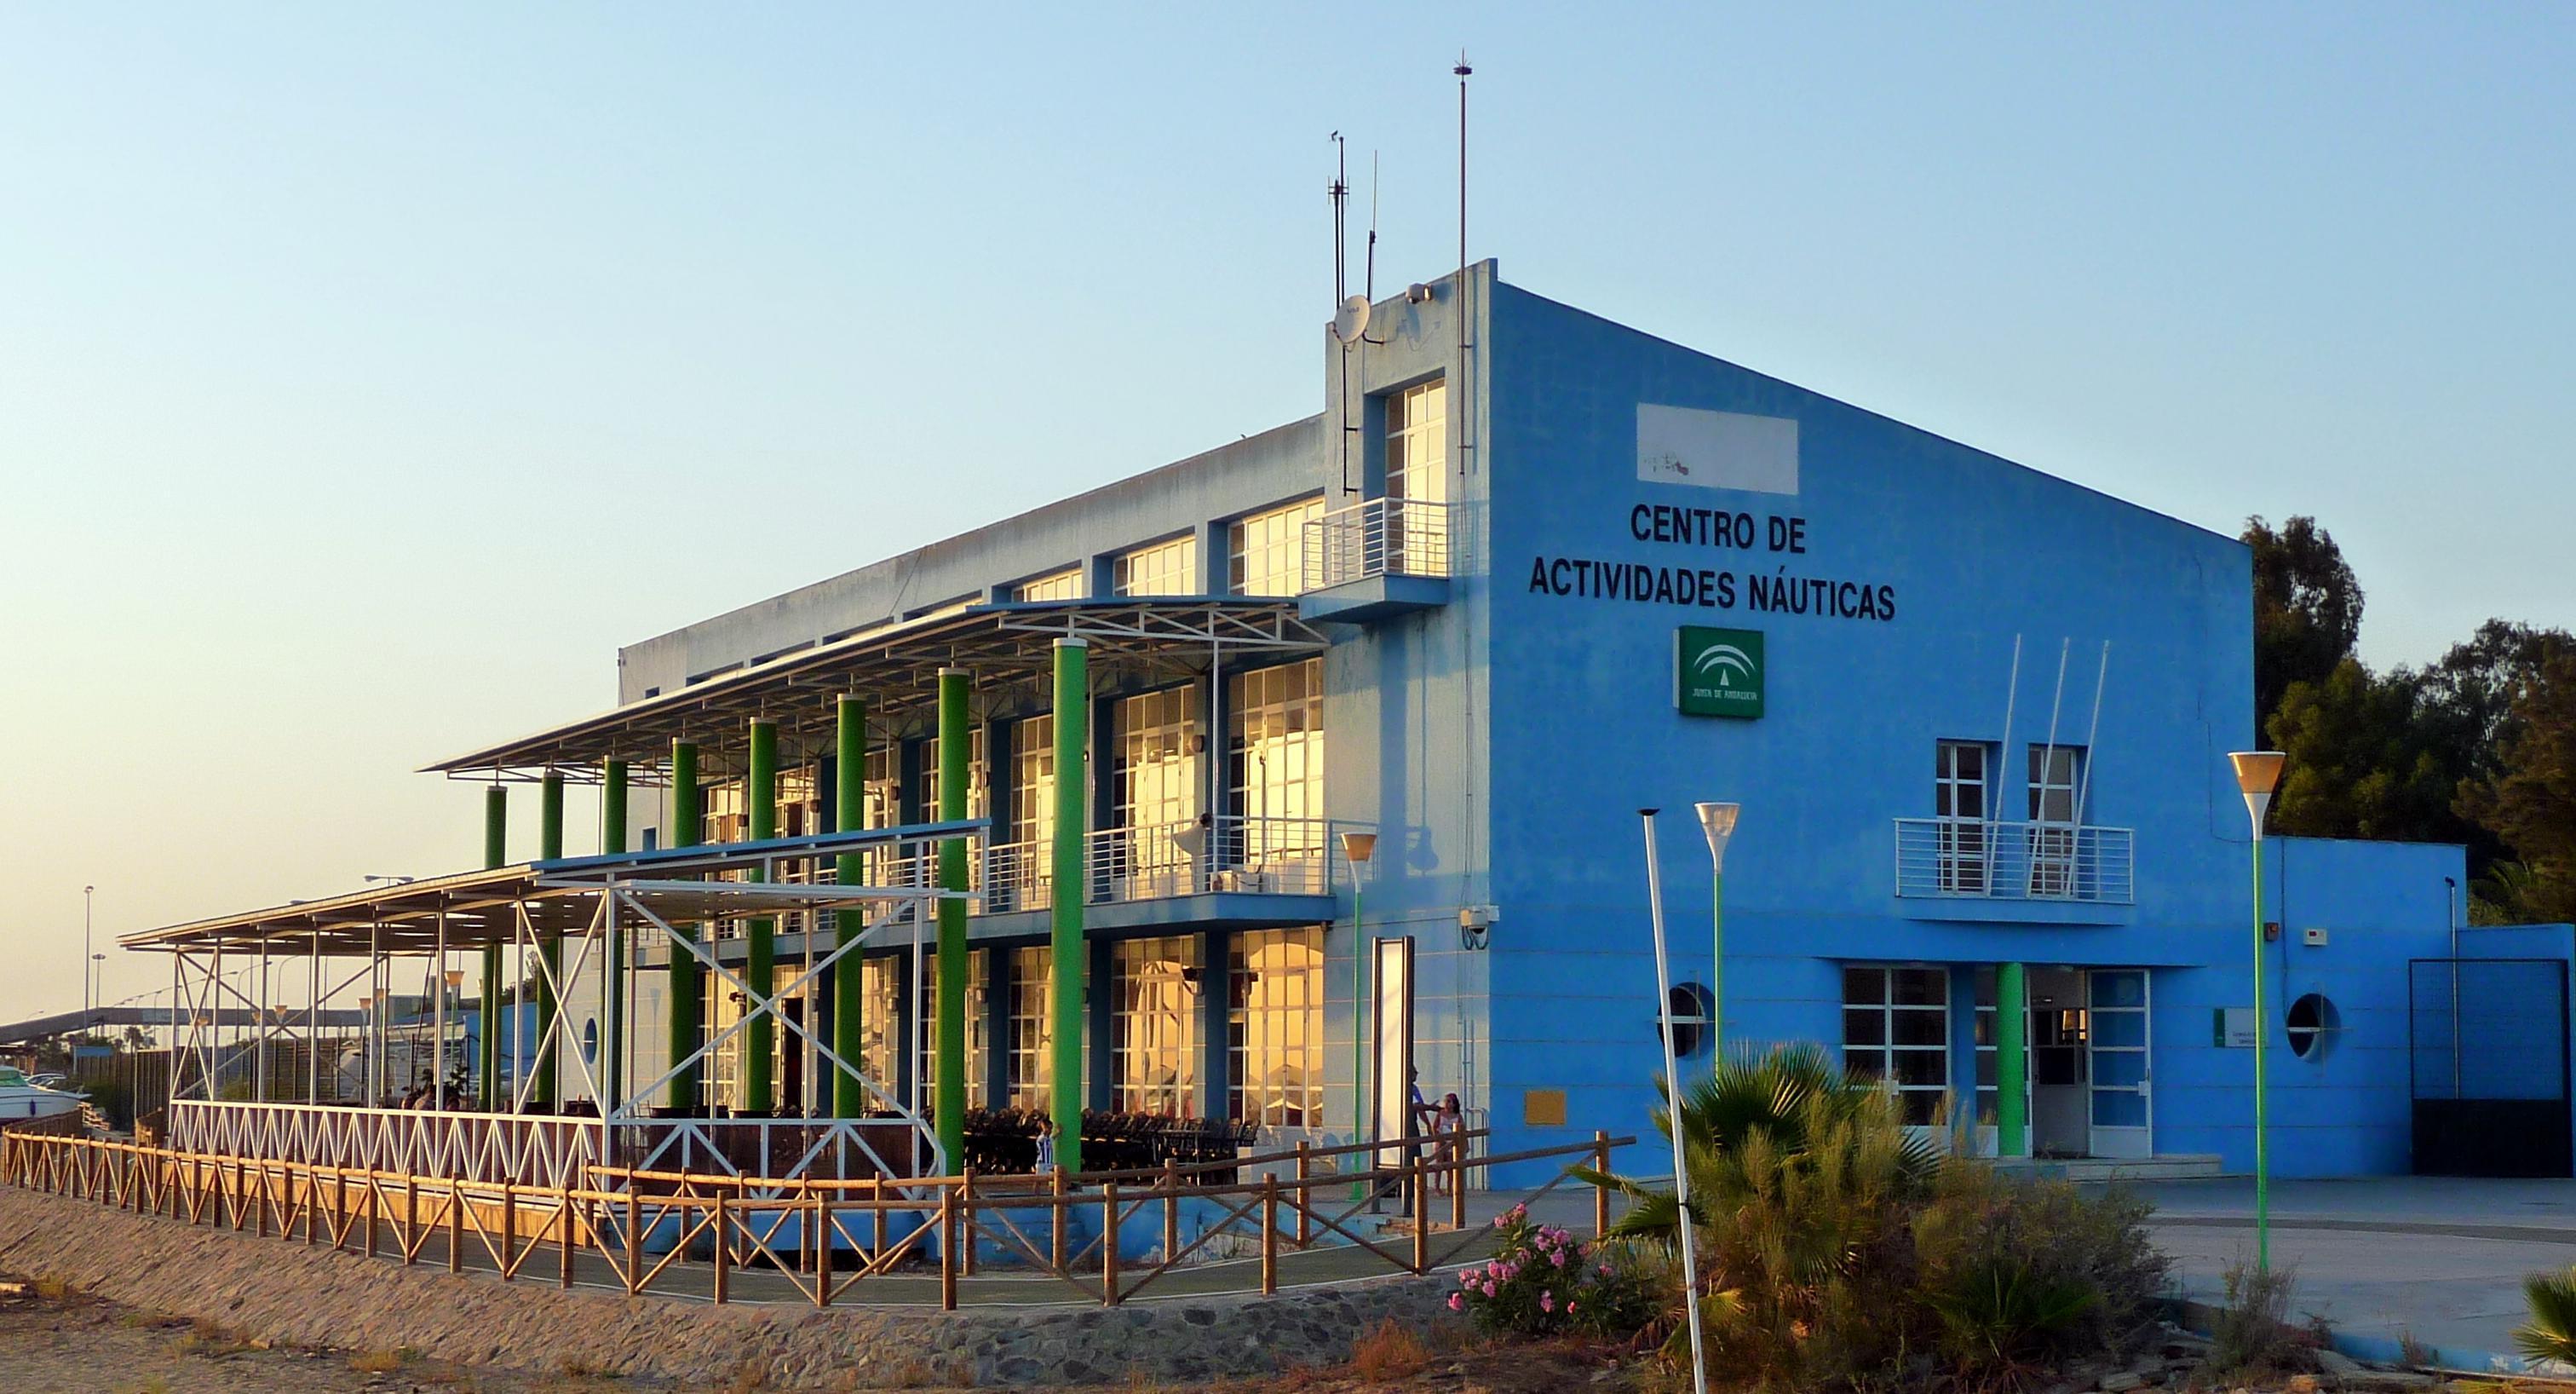 Centro de Actividades Náuticas de Huelva